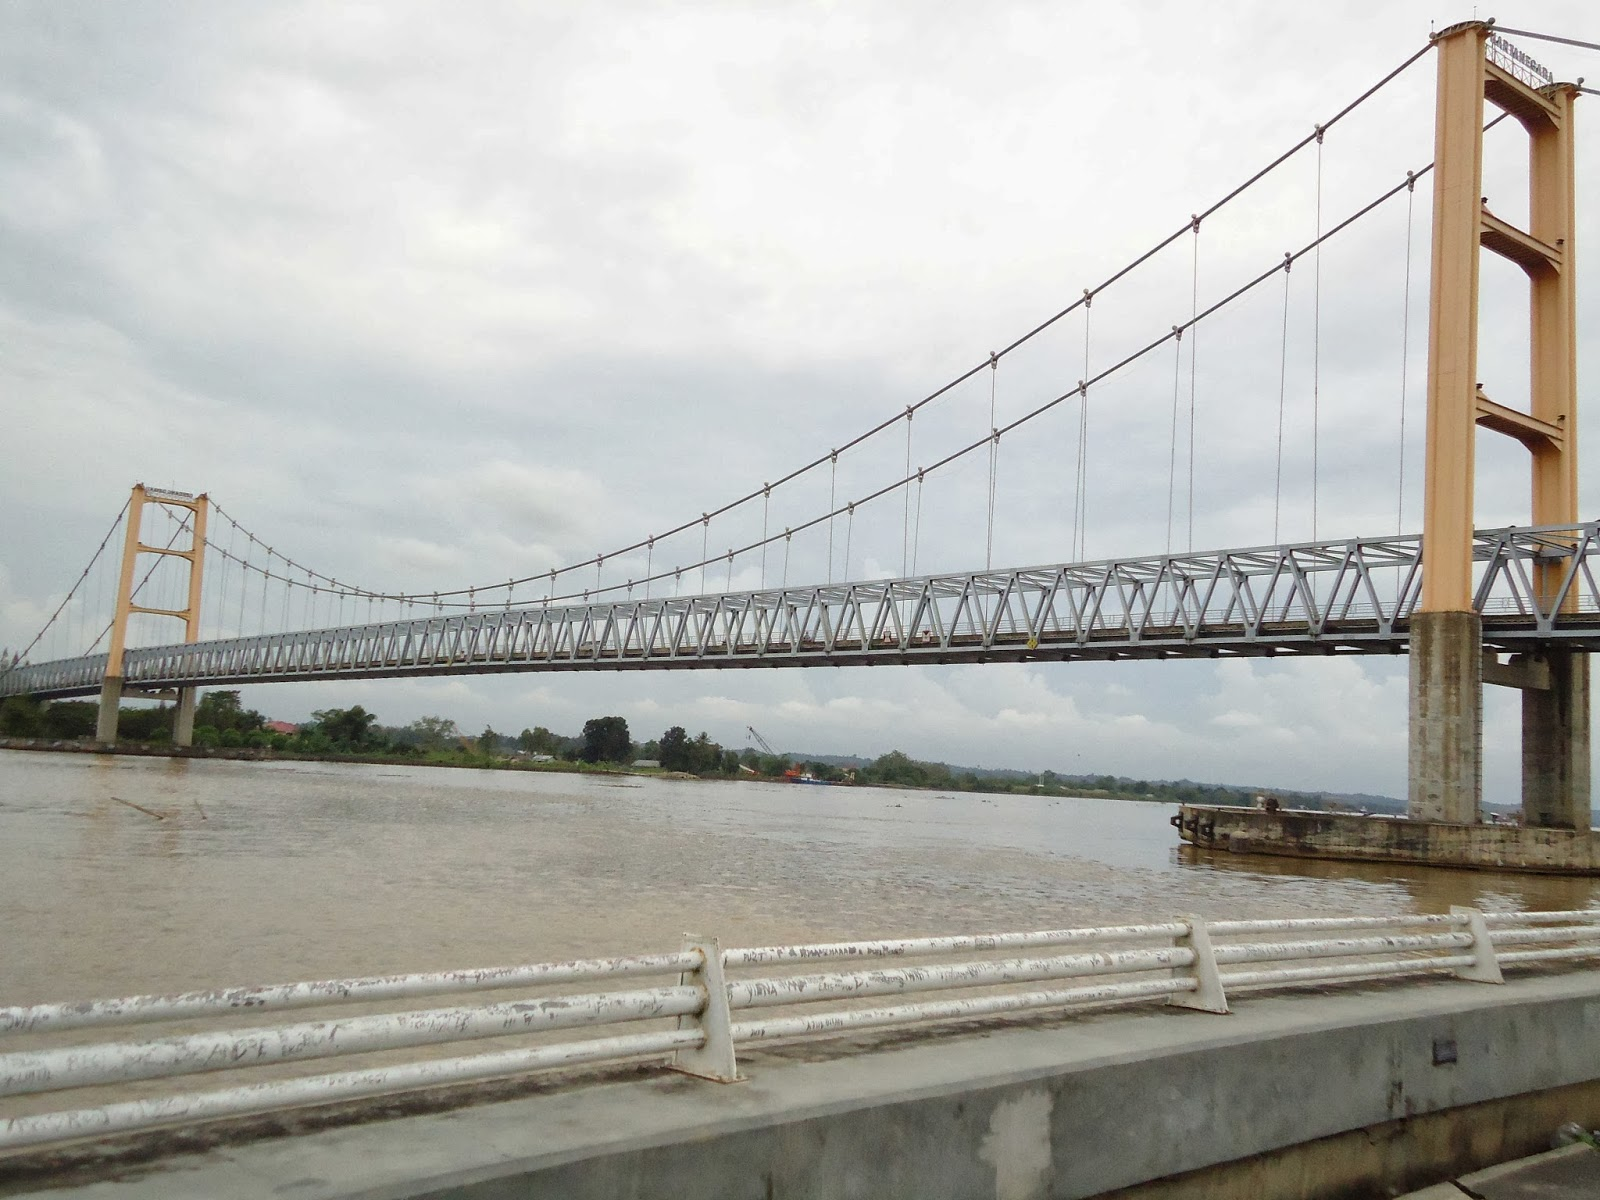 Tepian Mahakam Wisata Sungai Informasi Kalimantan Patung Pesut Kota Samarinda